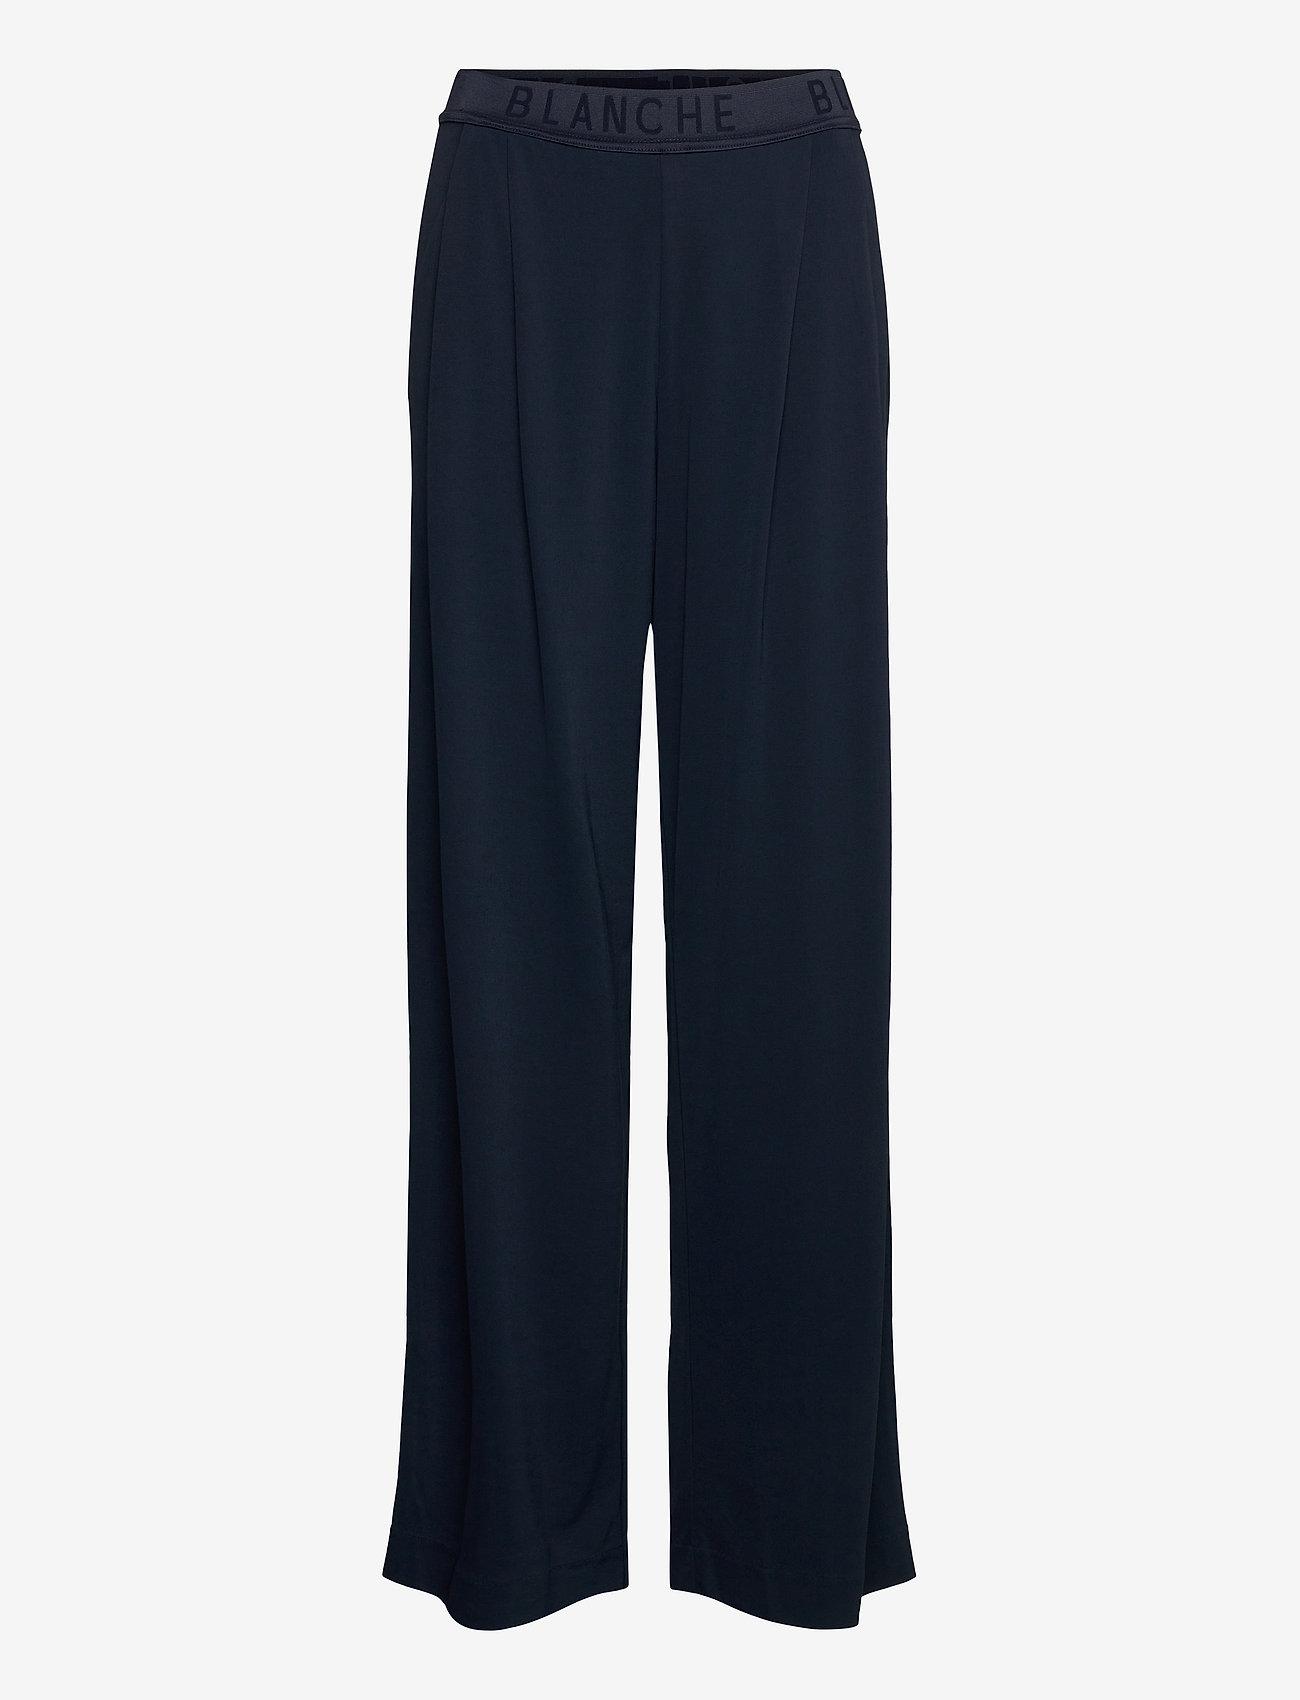 Blanche - Carisi Pants - sale - navy - 0